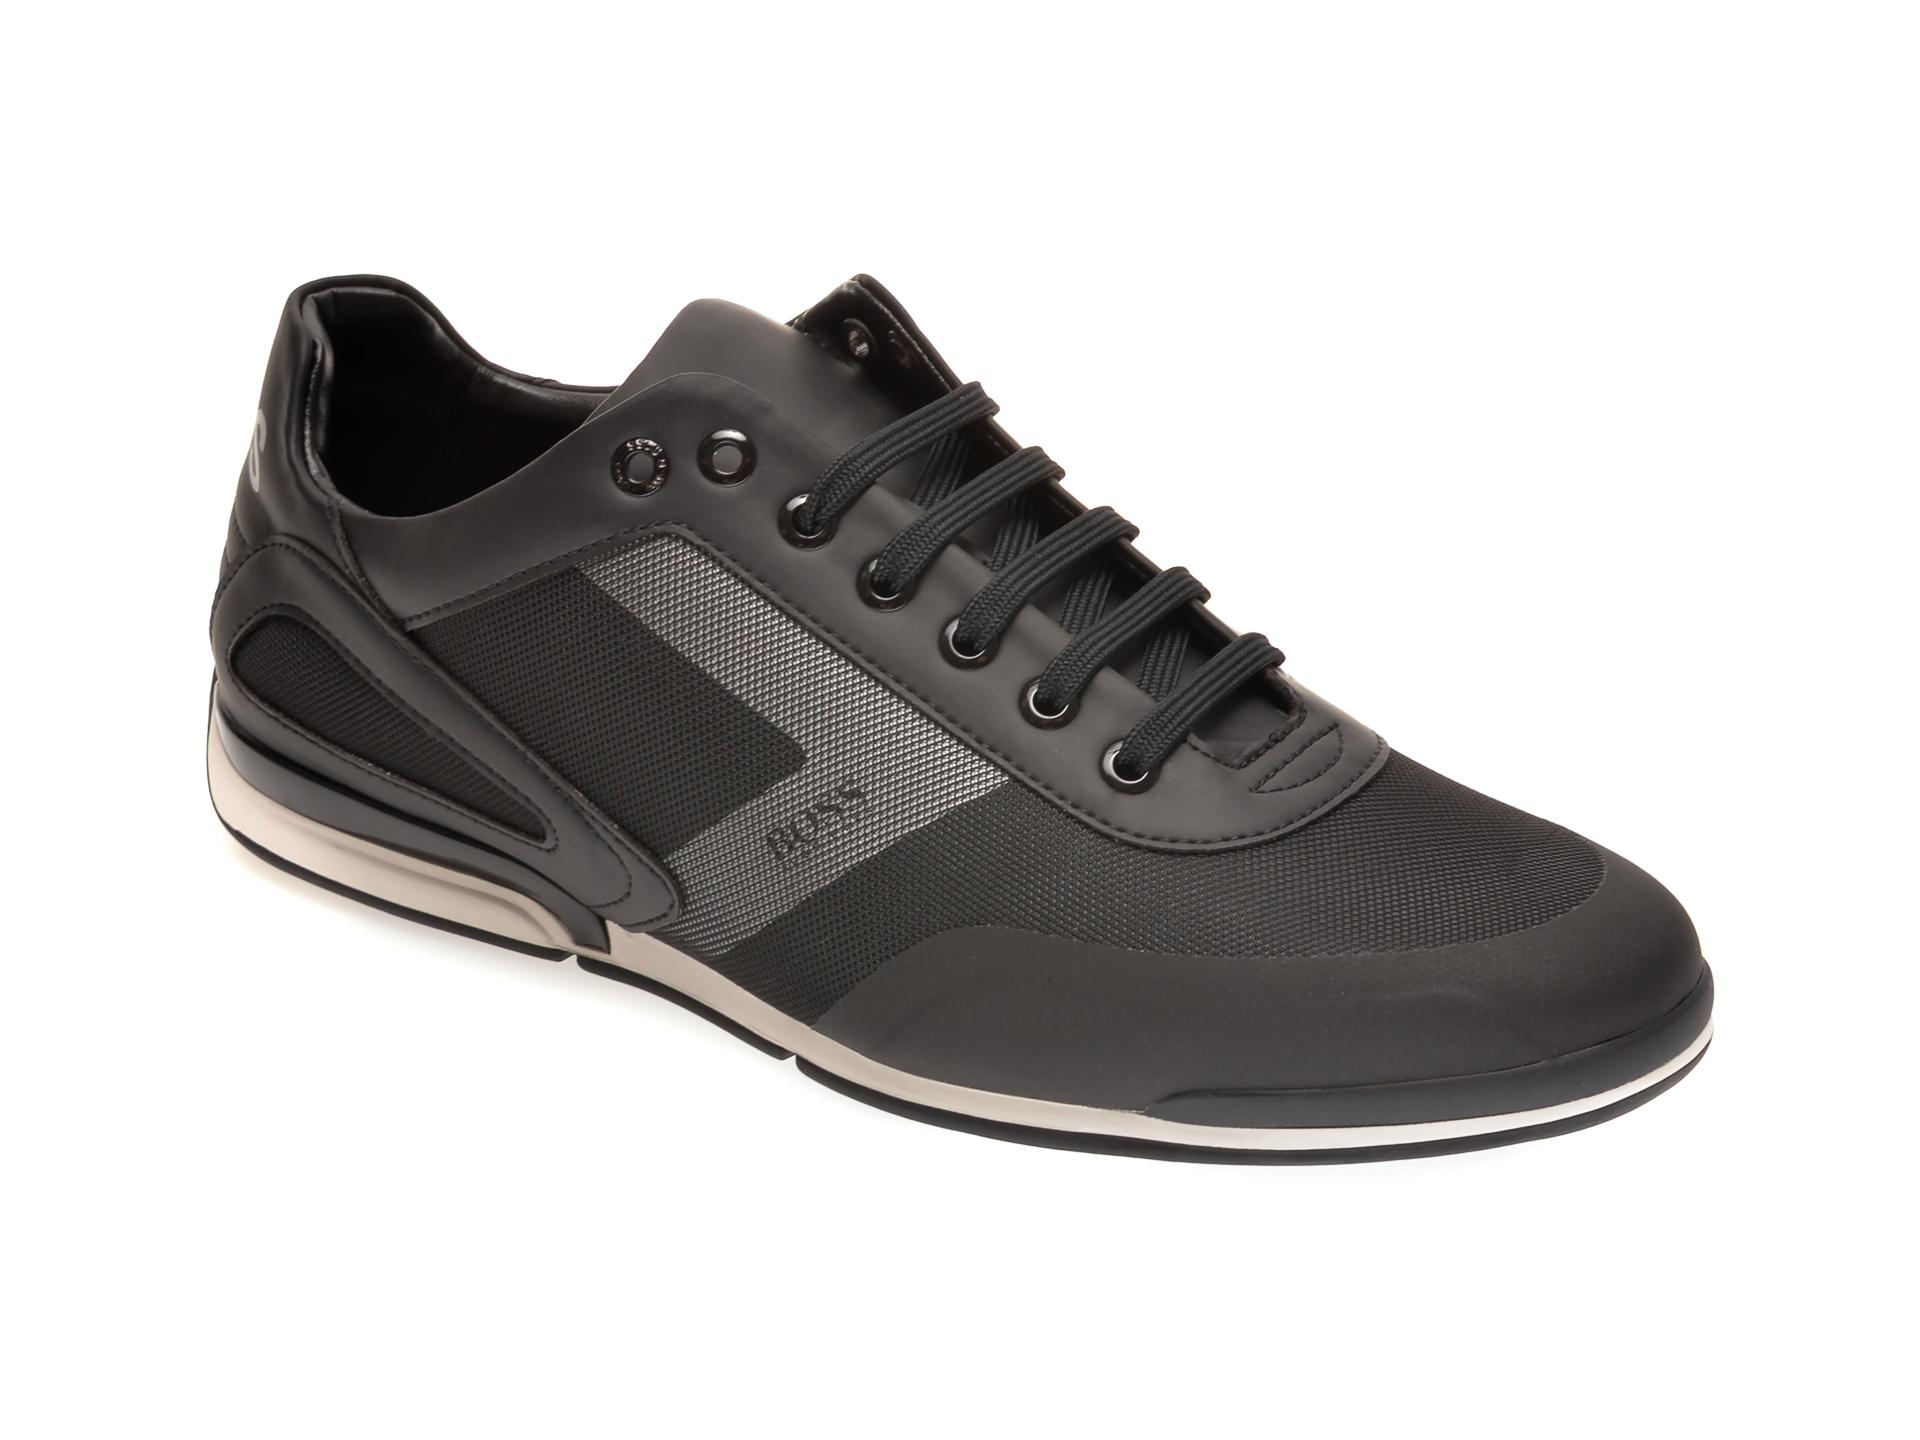 Pantofi sport HUGO BOSS negri, 9553, din material textil si piele ecologica imagine